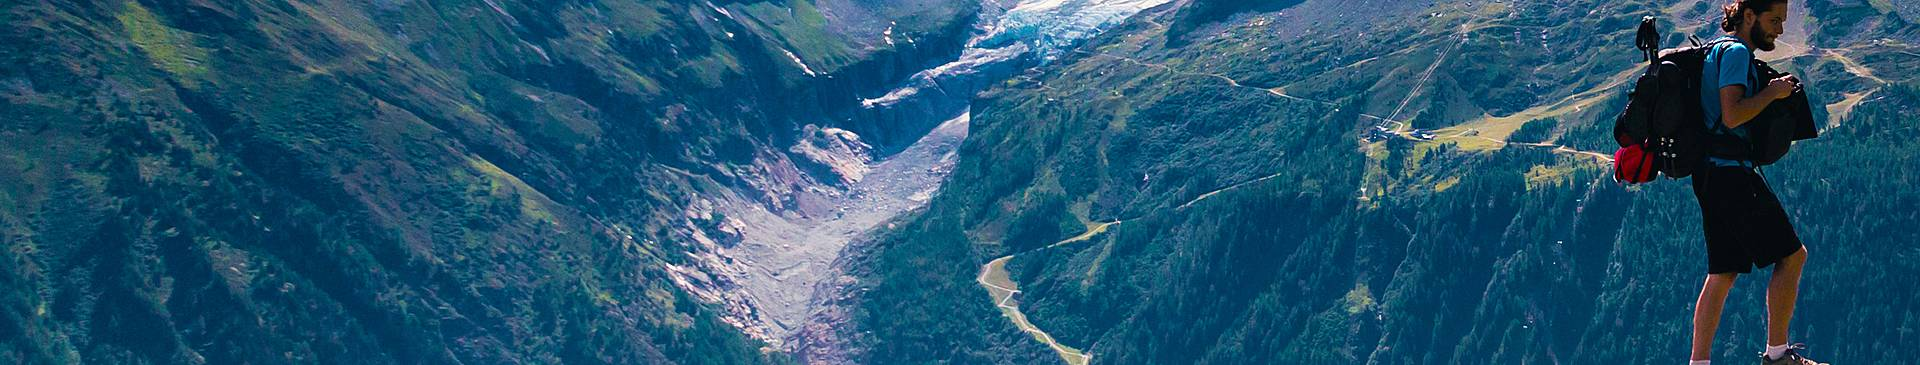 Circuits Rando et Trek en Italie